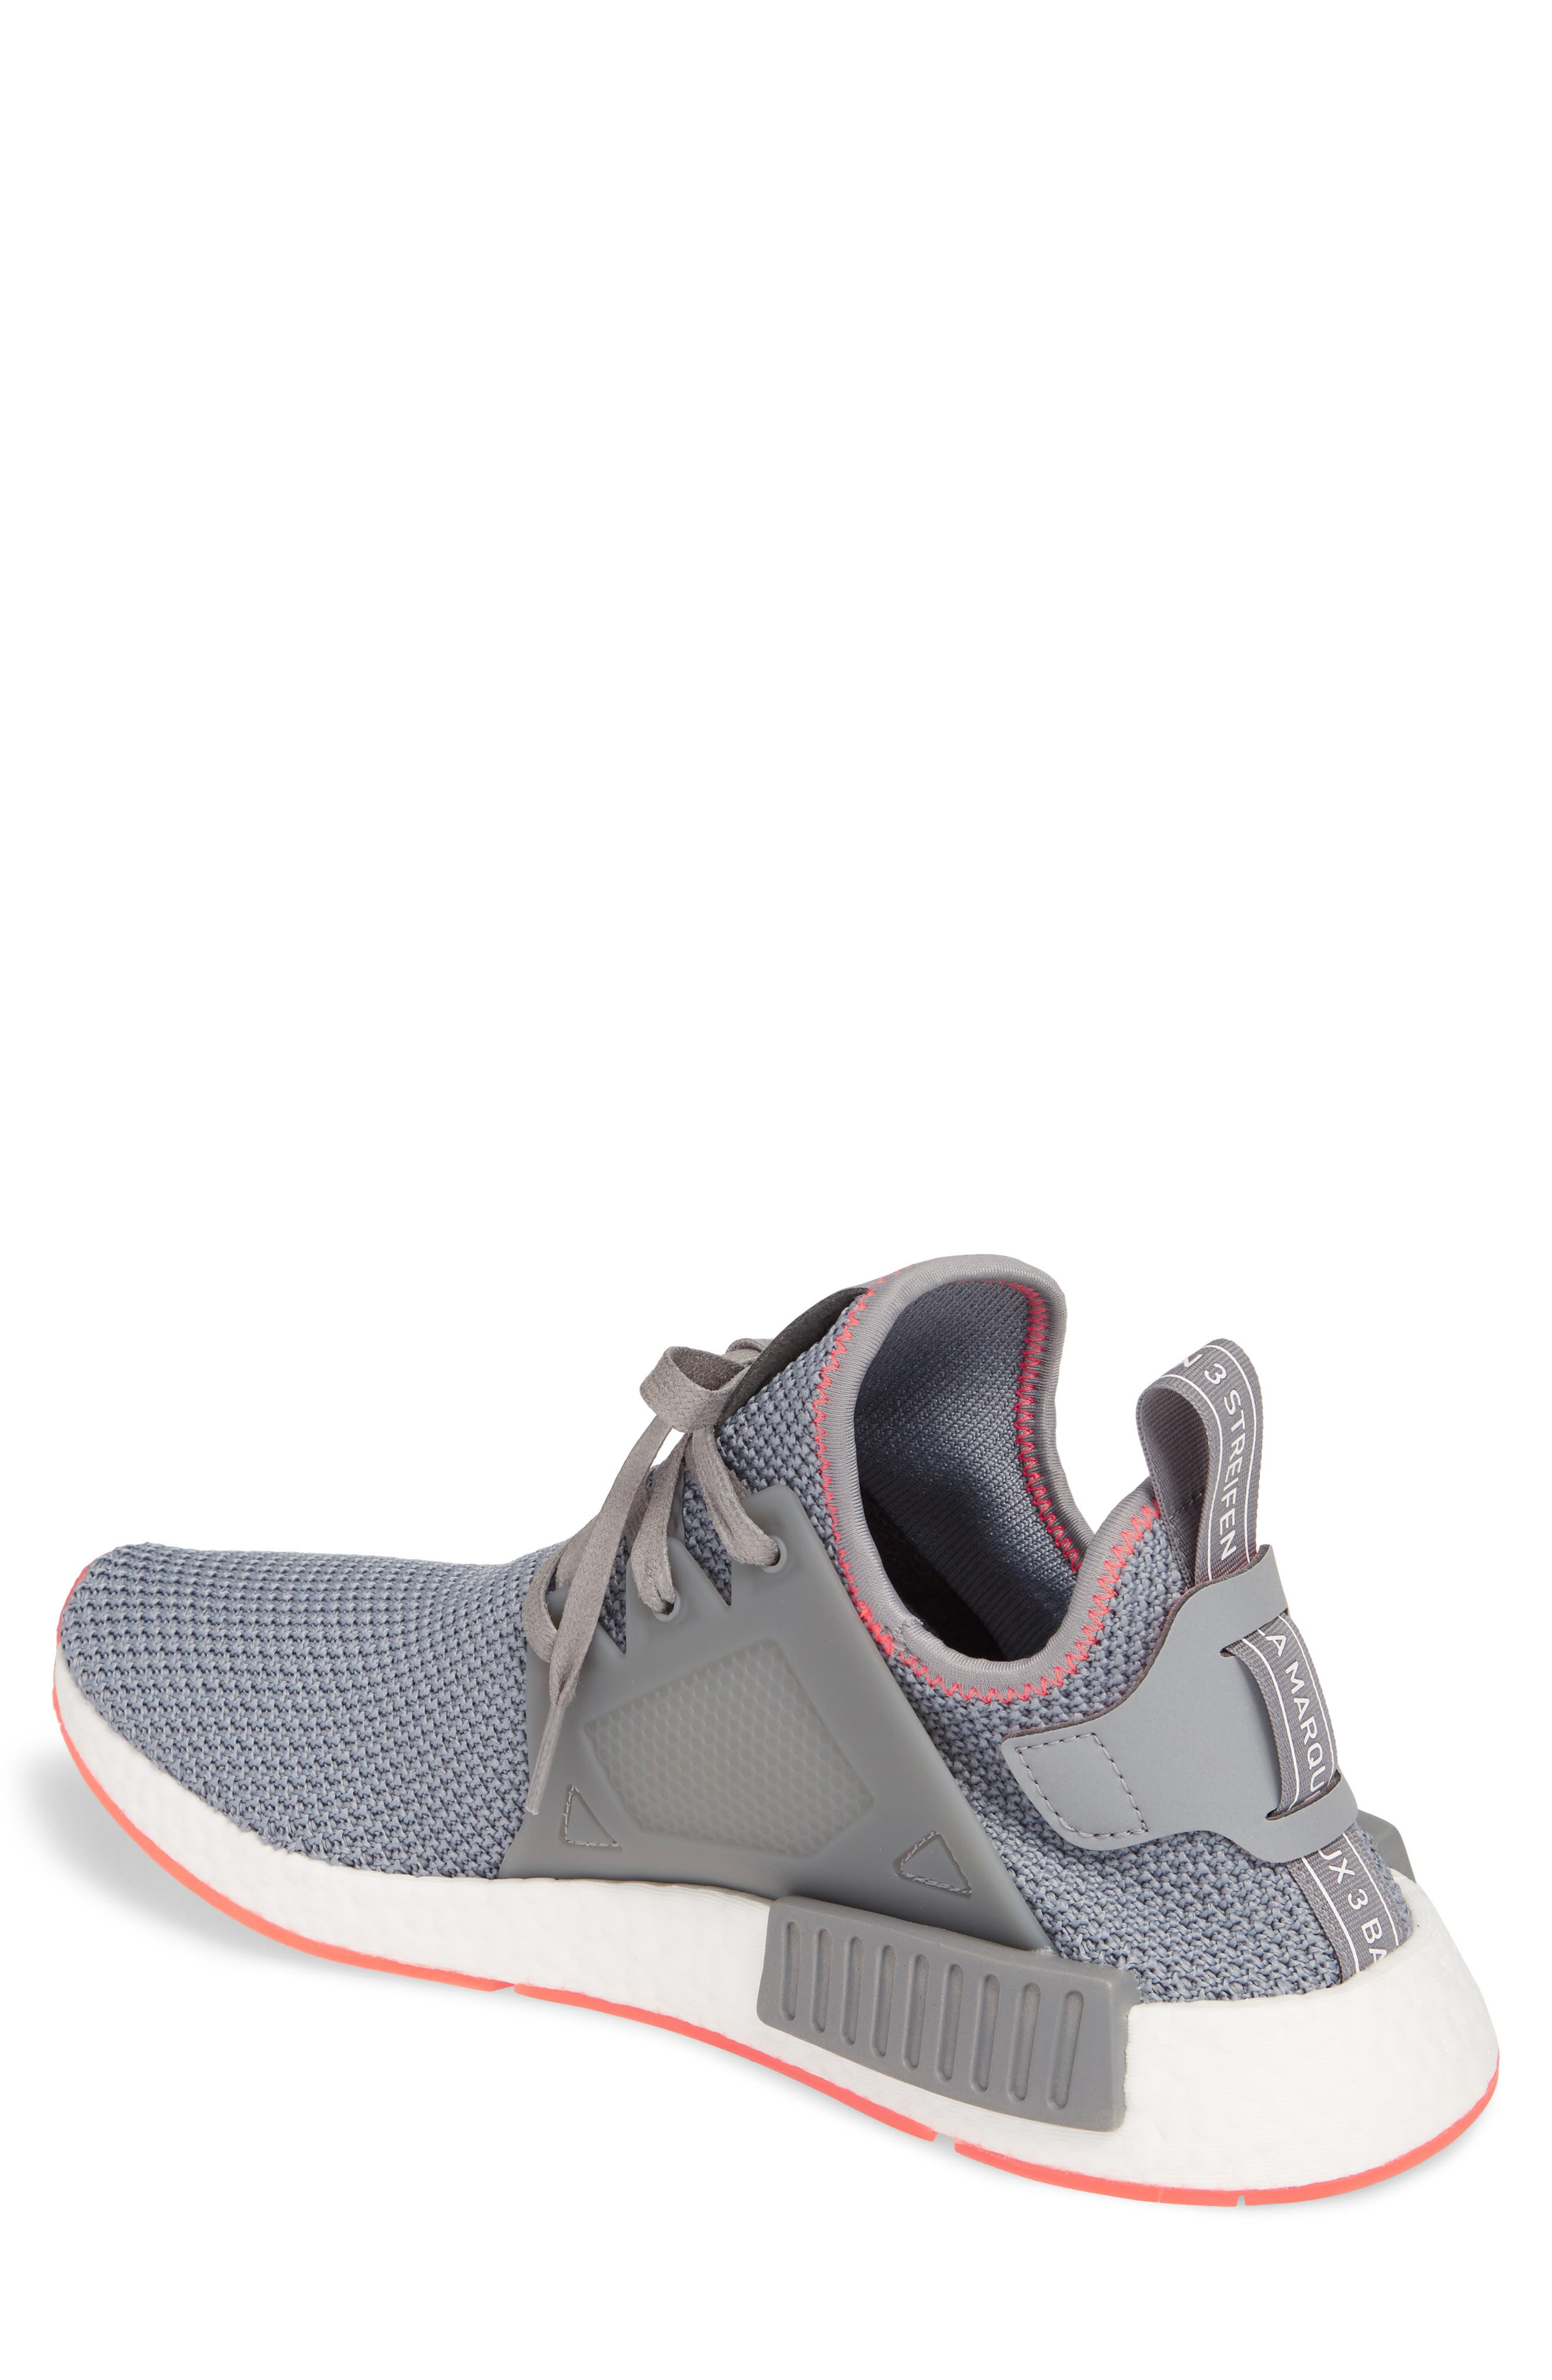 NMD_XR1 Sneaker,                             Alternate thumbnail 4, color,